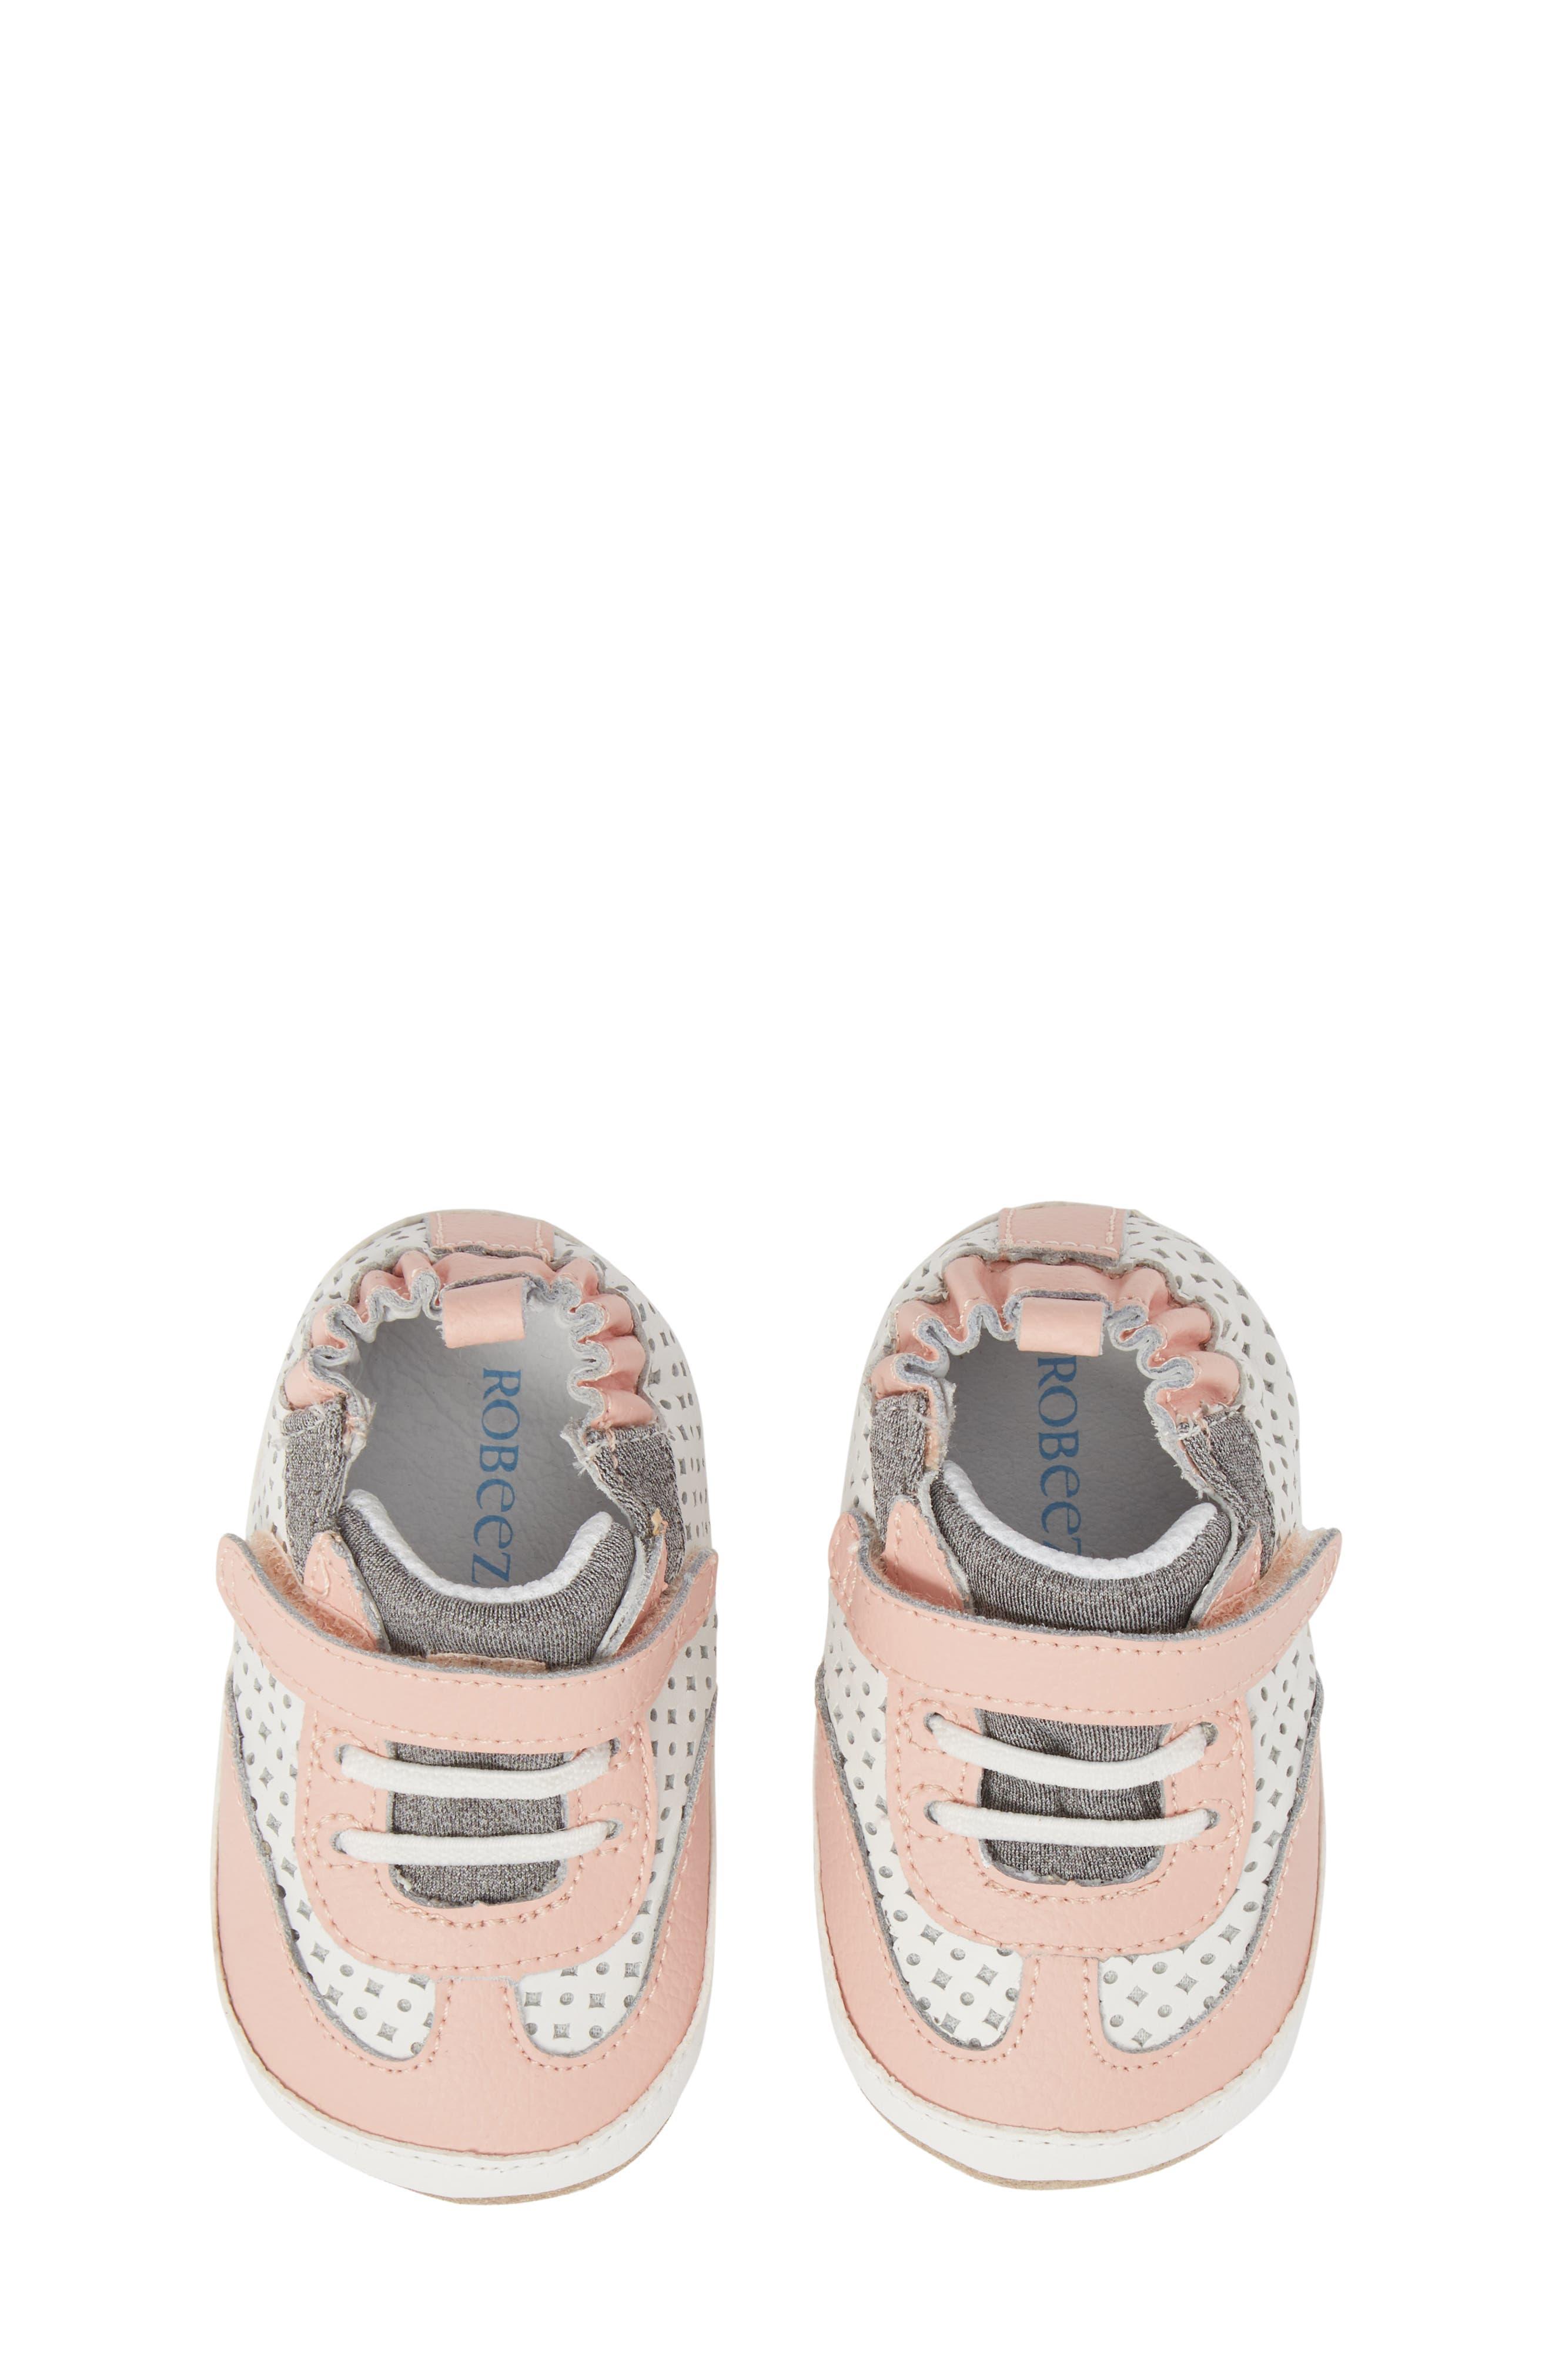 Mini Shoez Katie's Kicks Sneaker,                             Main thumbnail 1, color,                             Pink